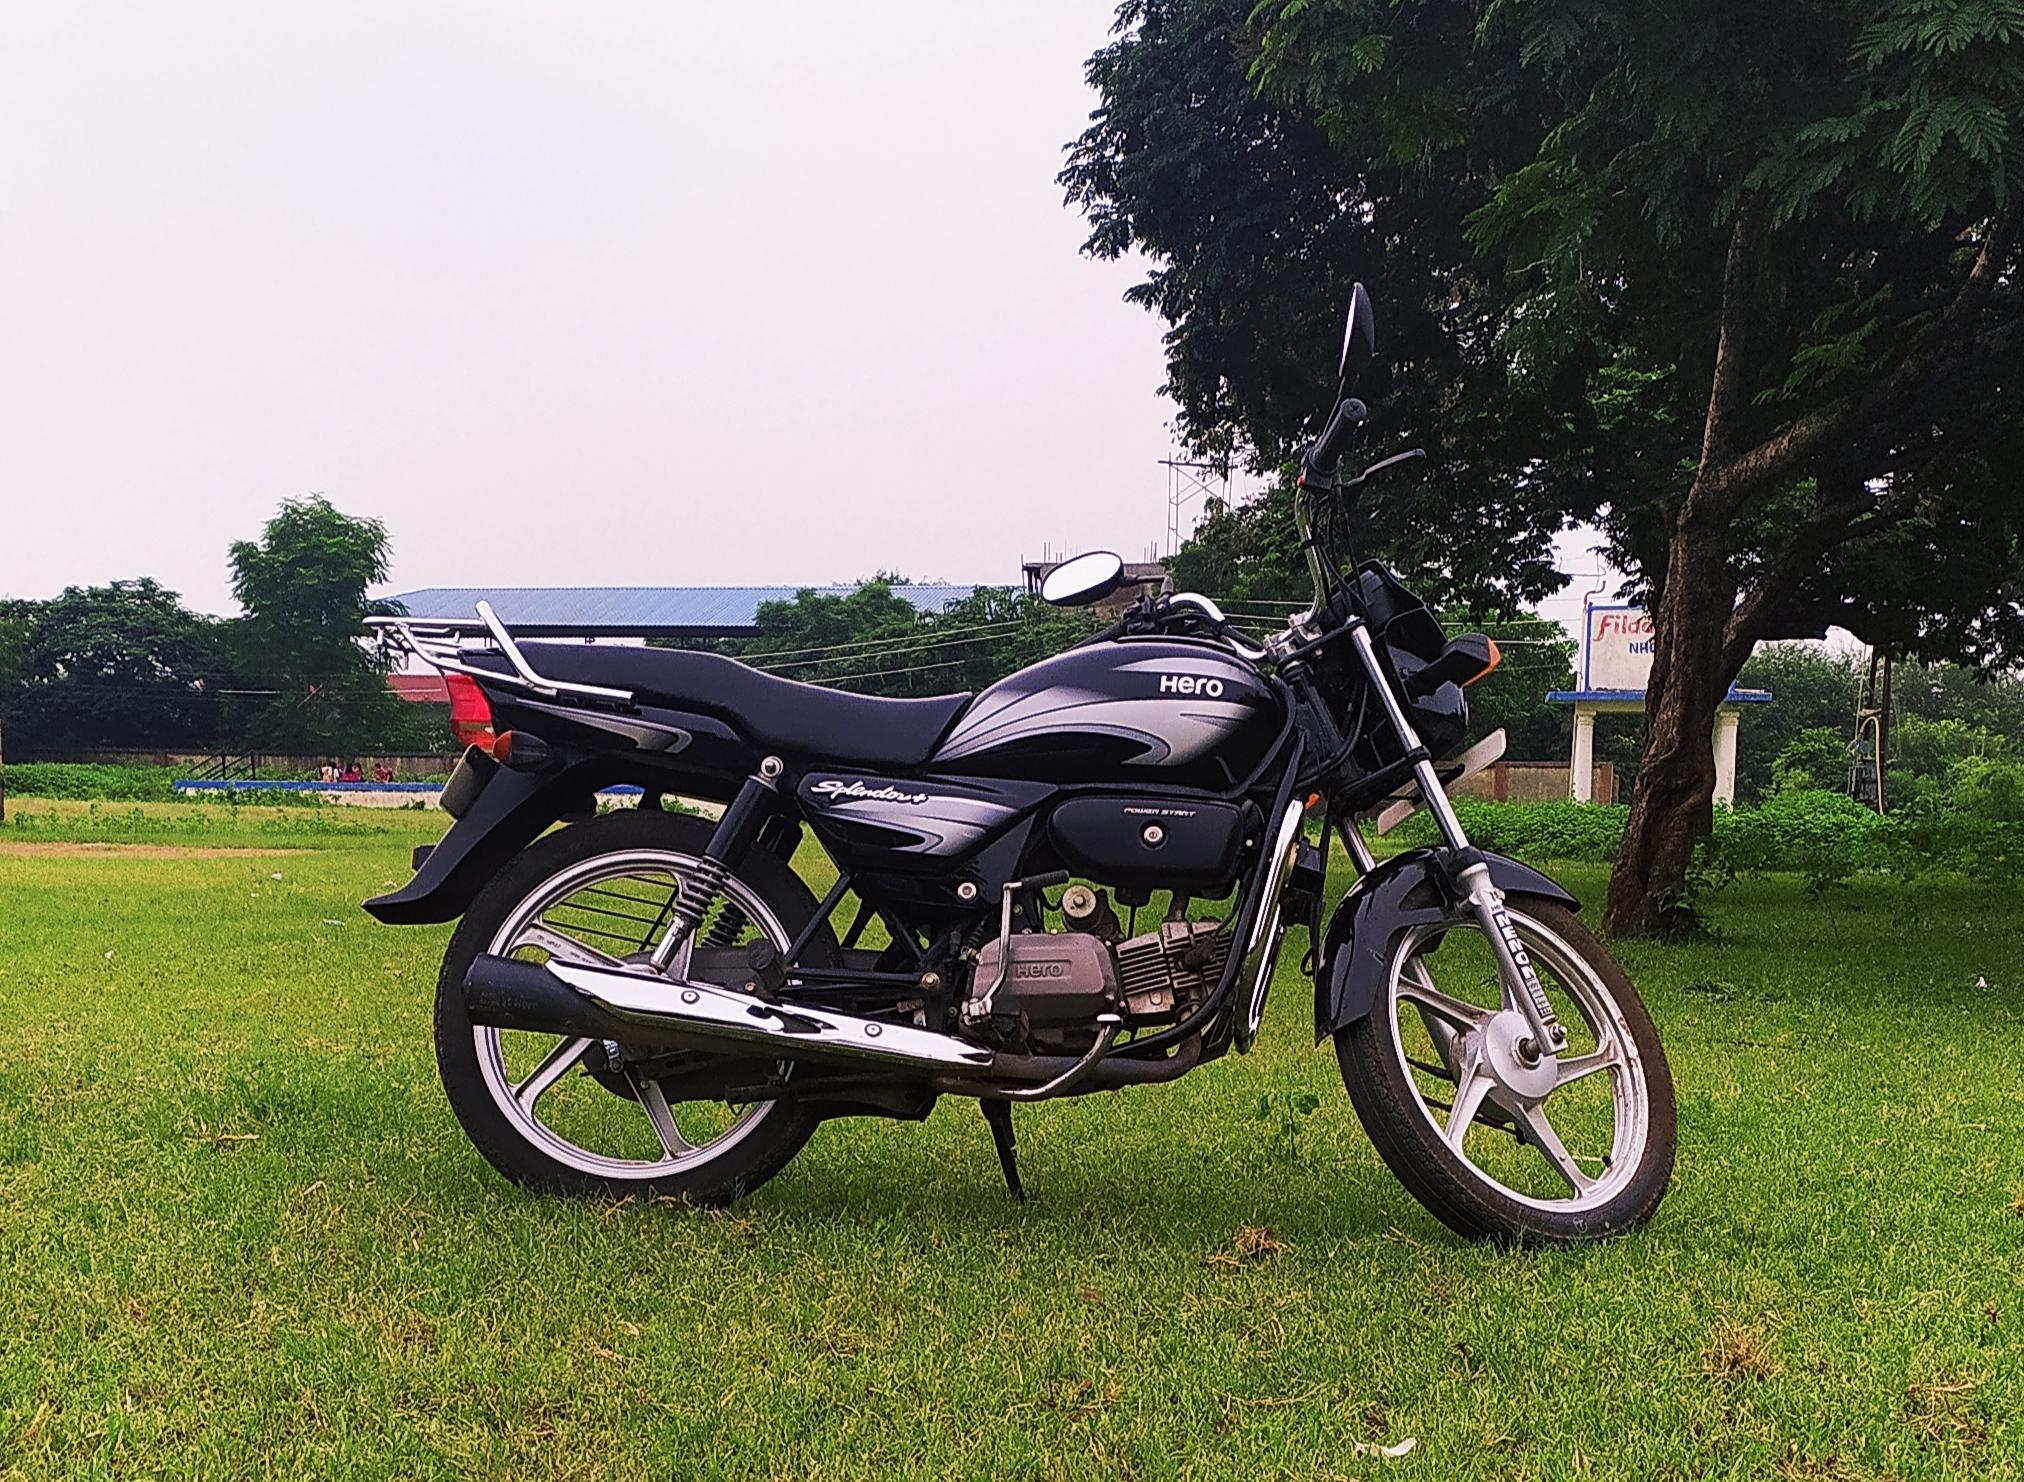 bike on grass